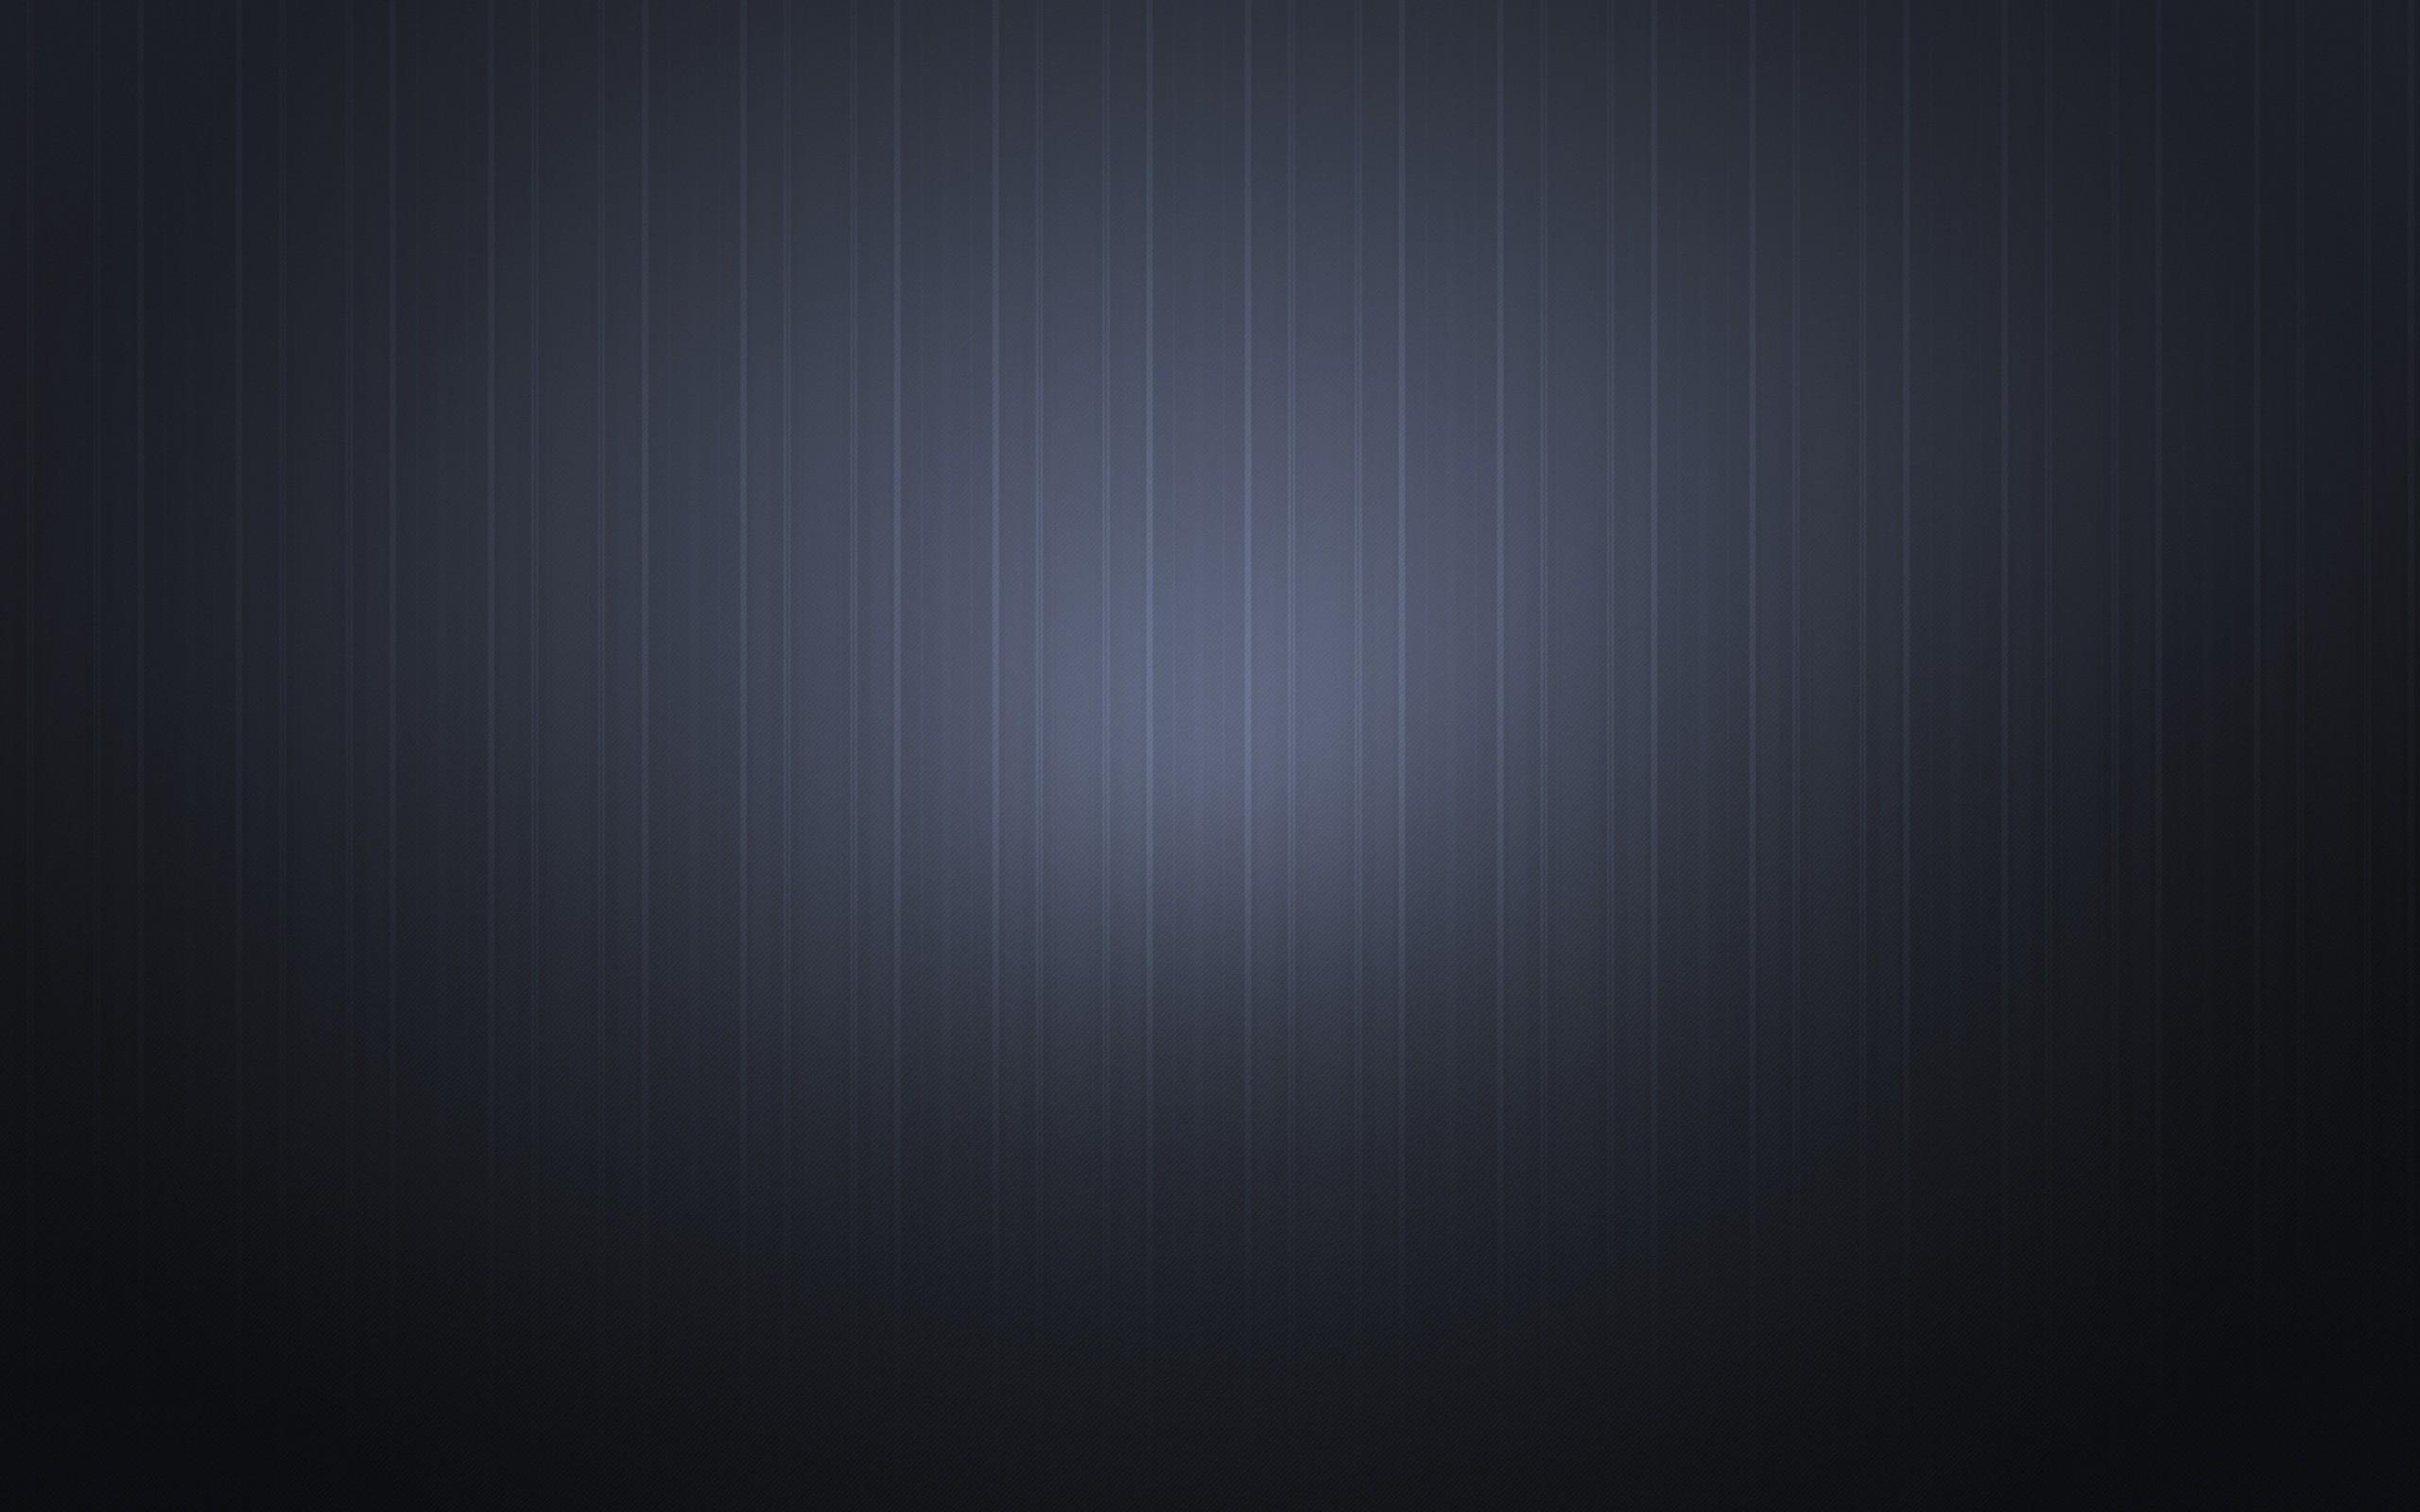 Dark gray background » Patterns » OldtimeWallpapers.com – Antique .